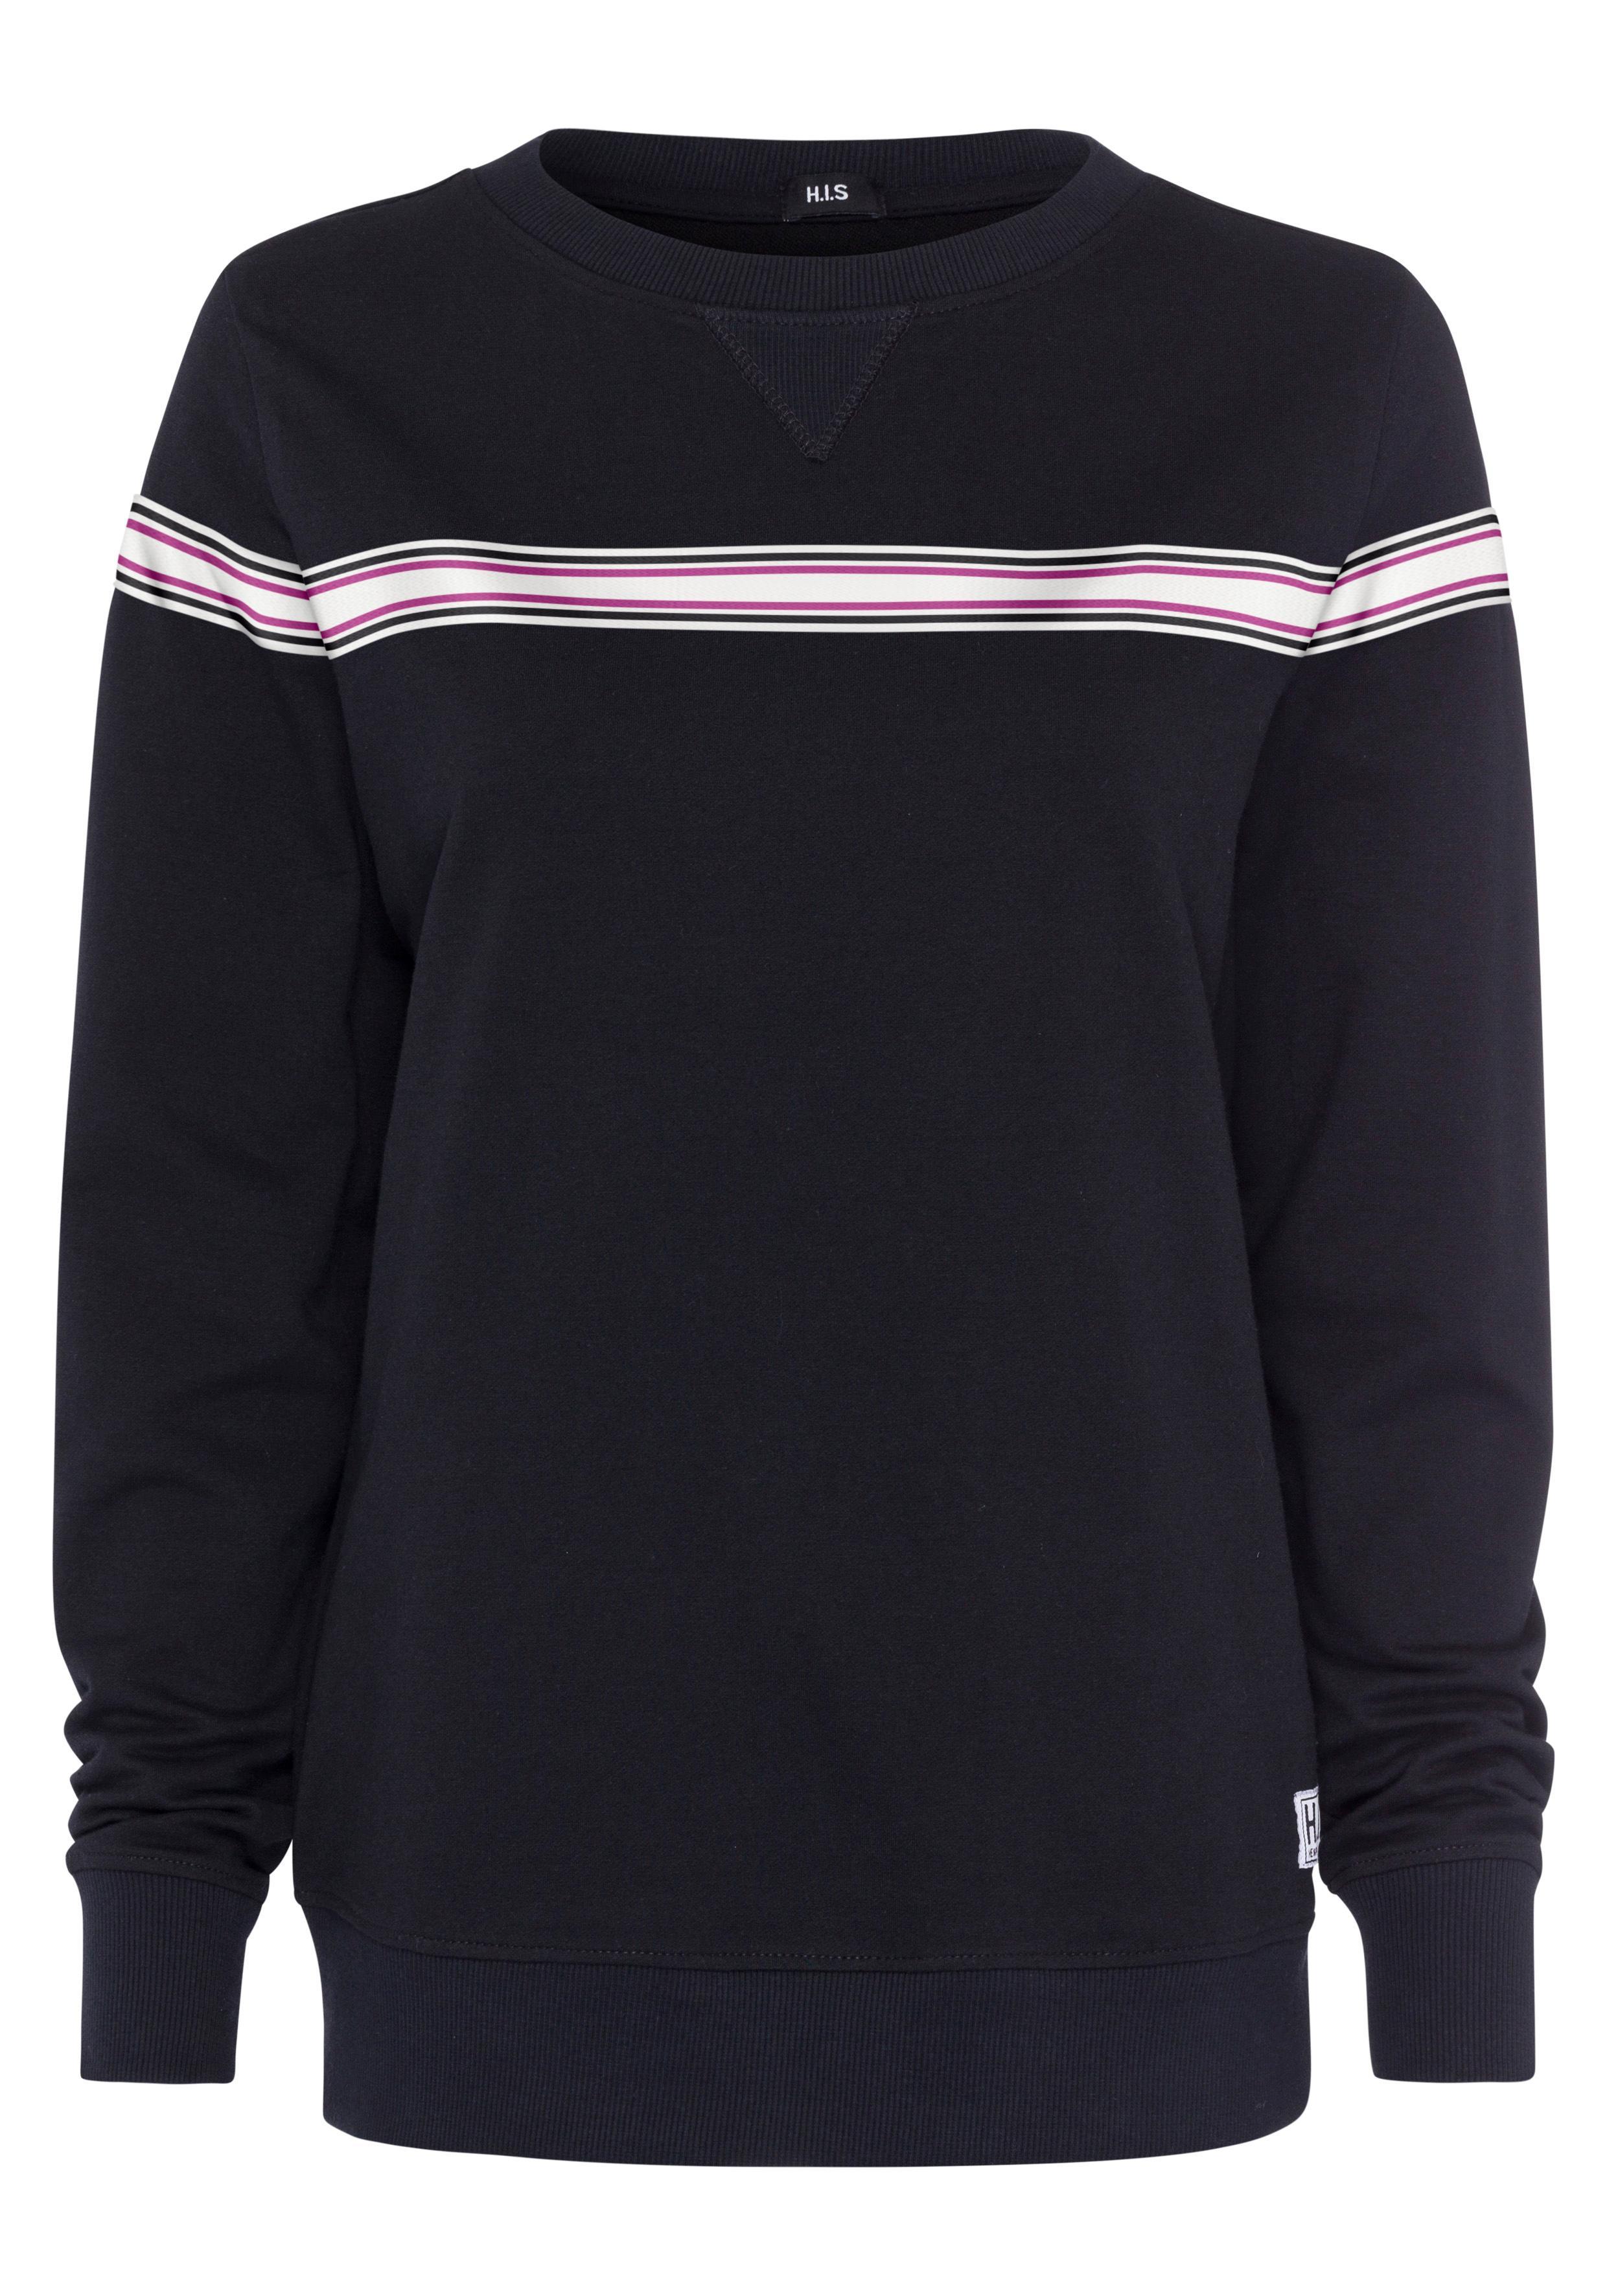 H.I.S Sweater